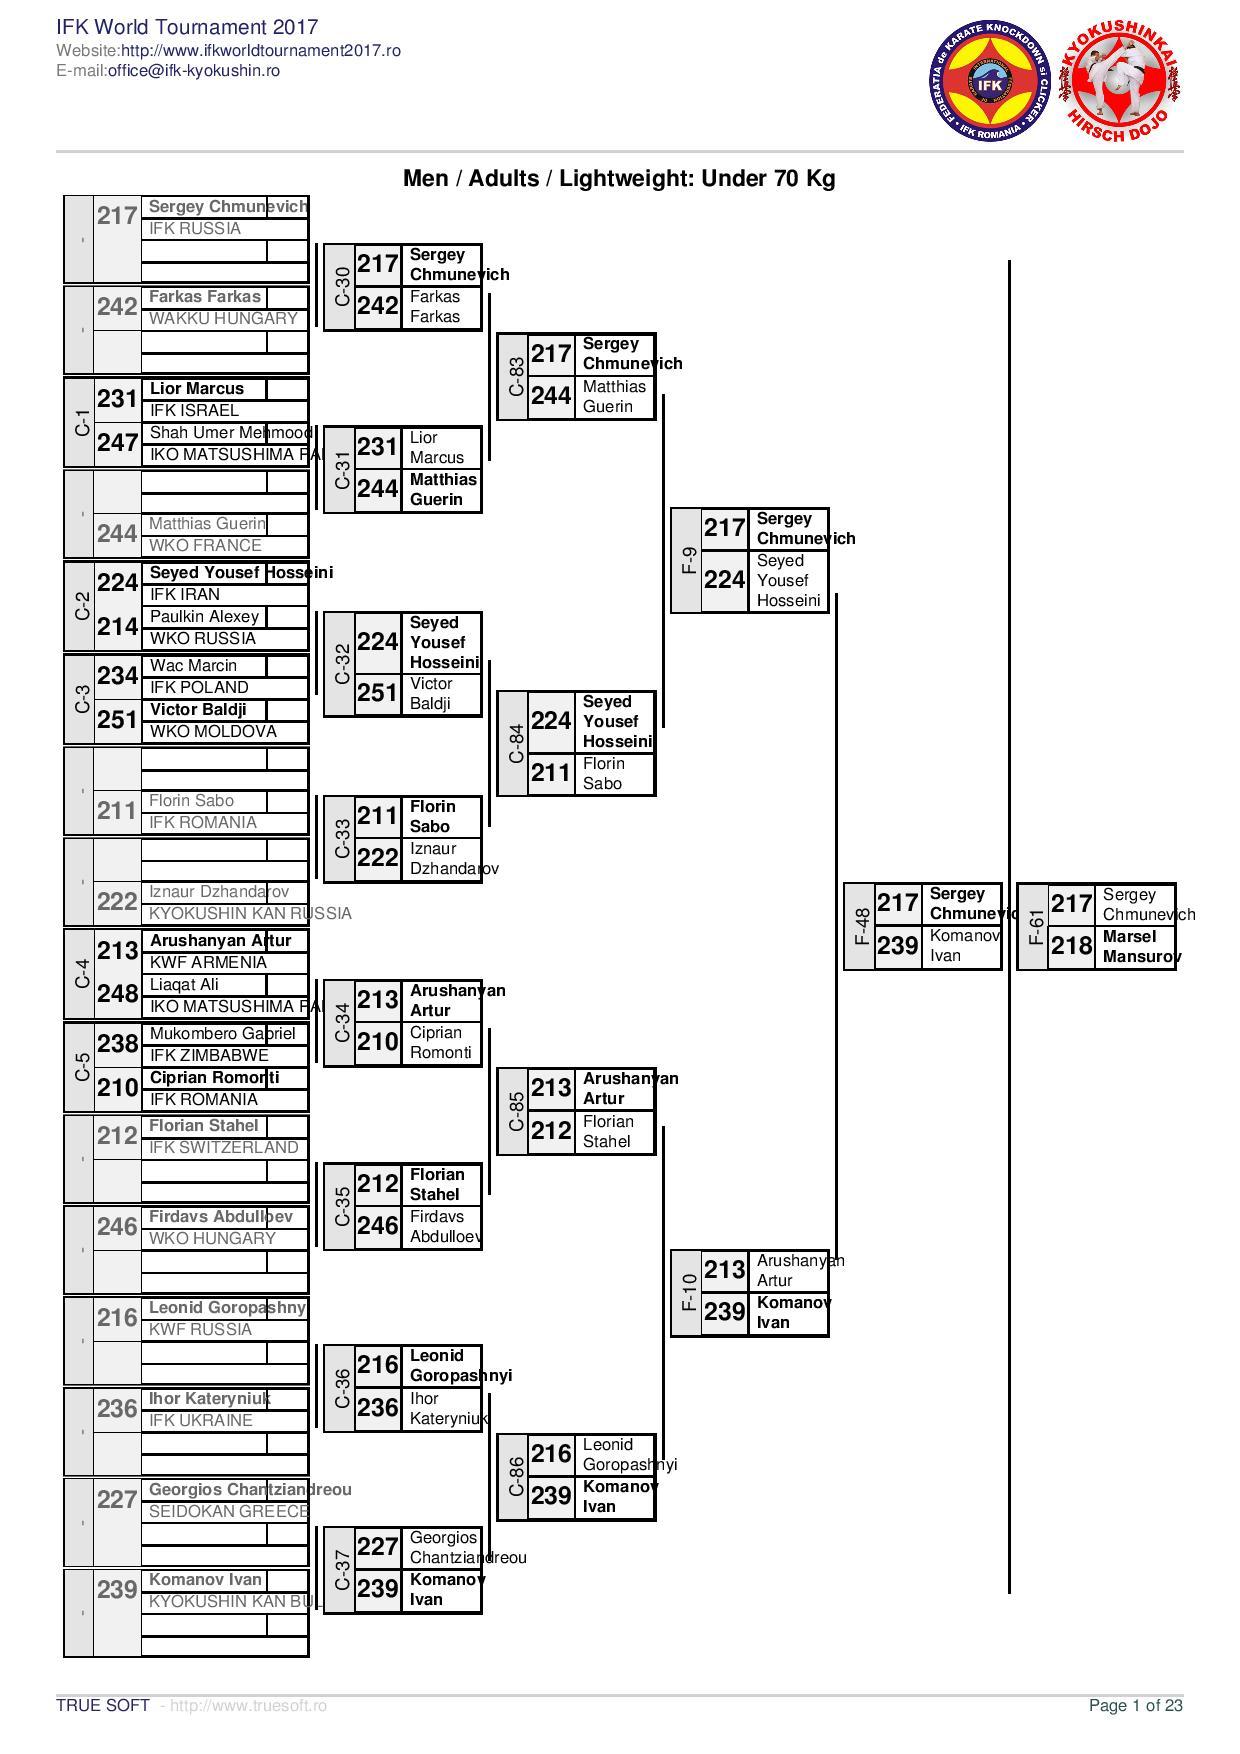 IFK World Tournament 2017 - Final   results-page-001.jpg